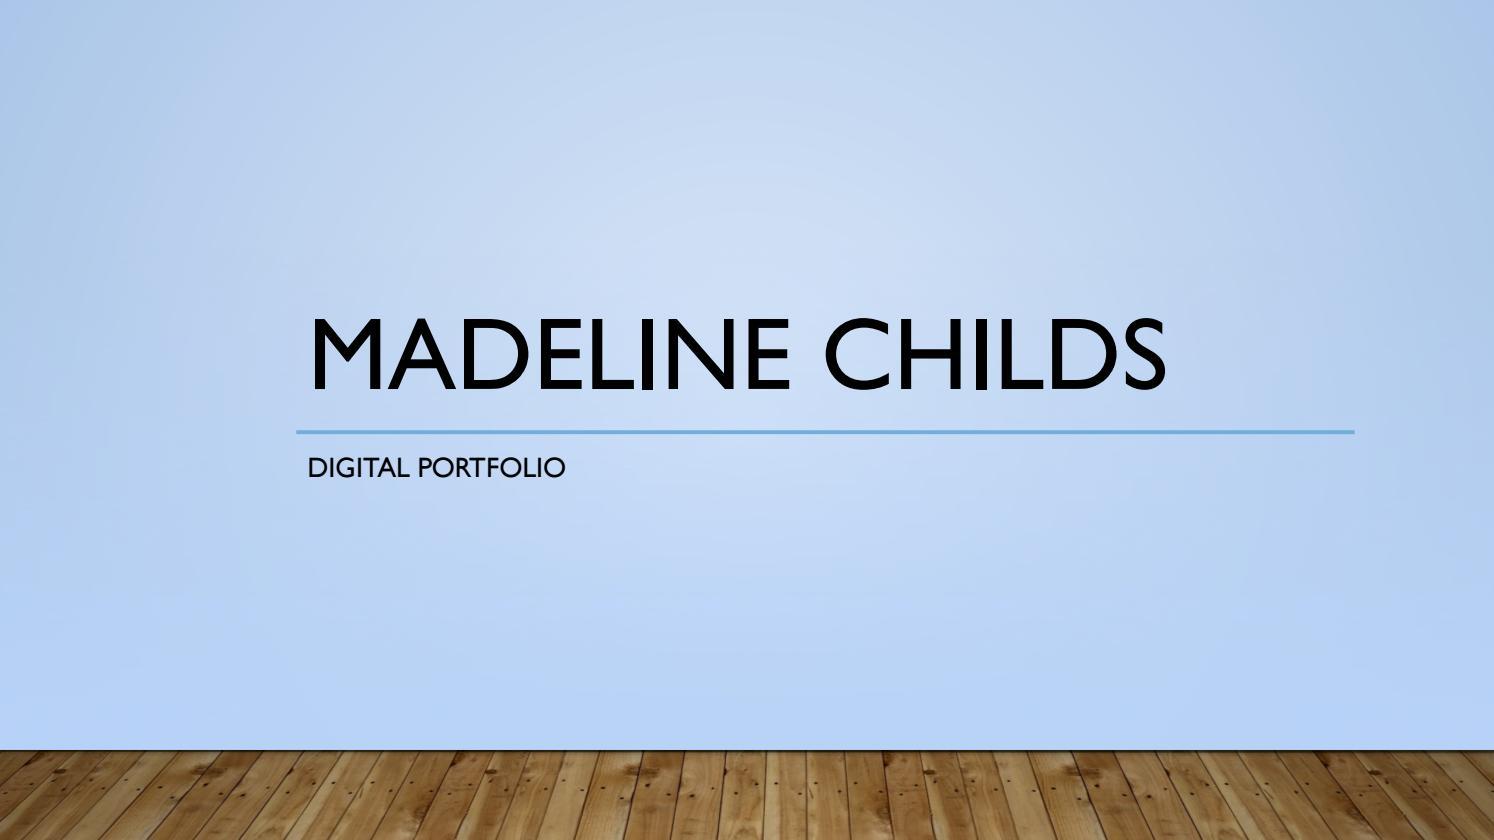 Madeline Childs Digital Portfolio By Madeline Childs Issuu